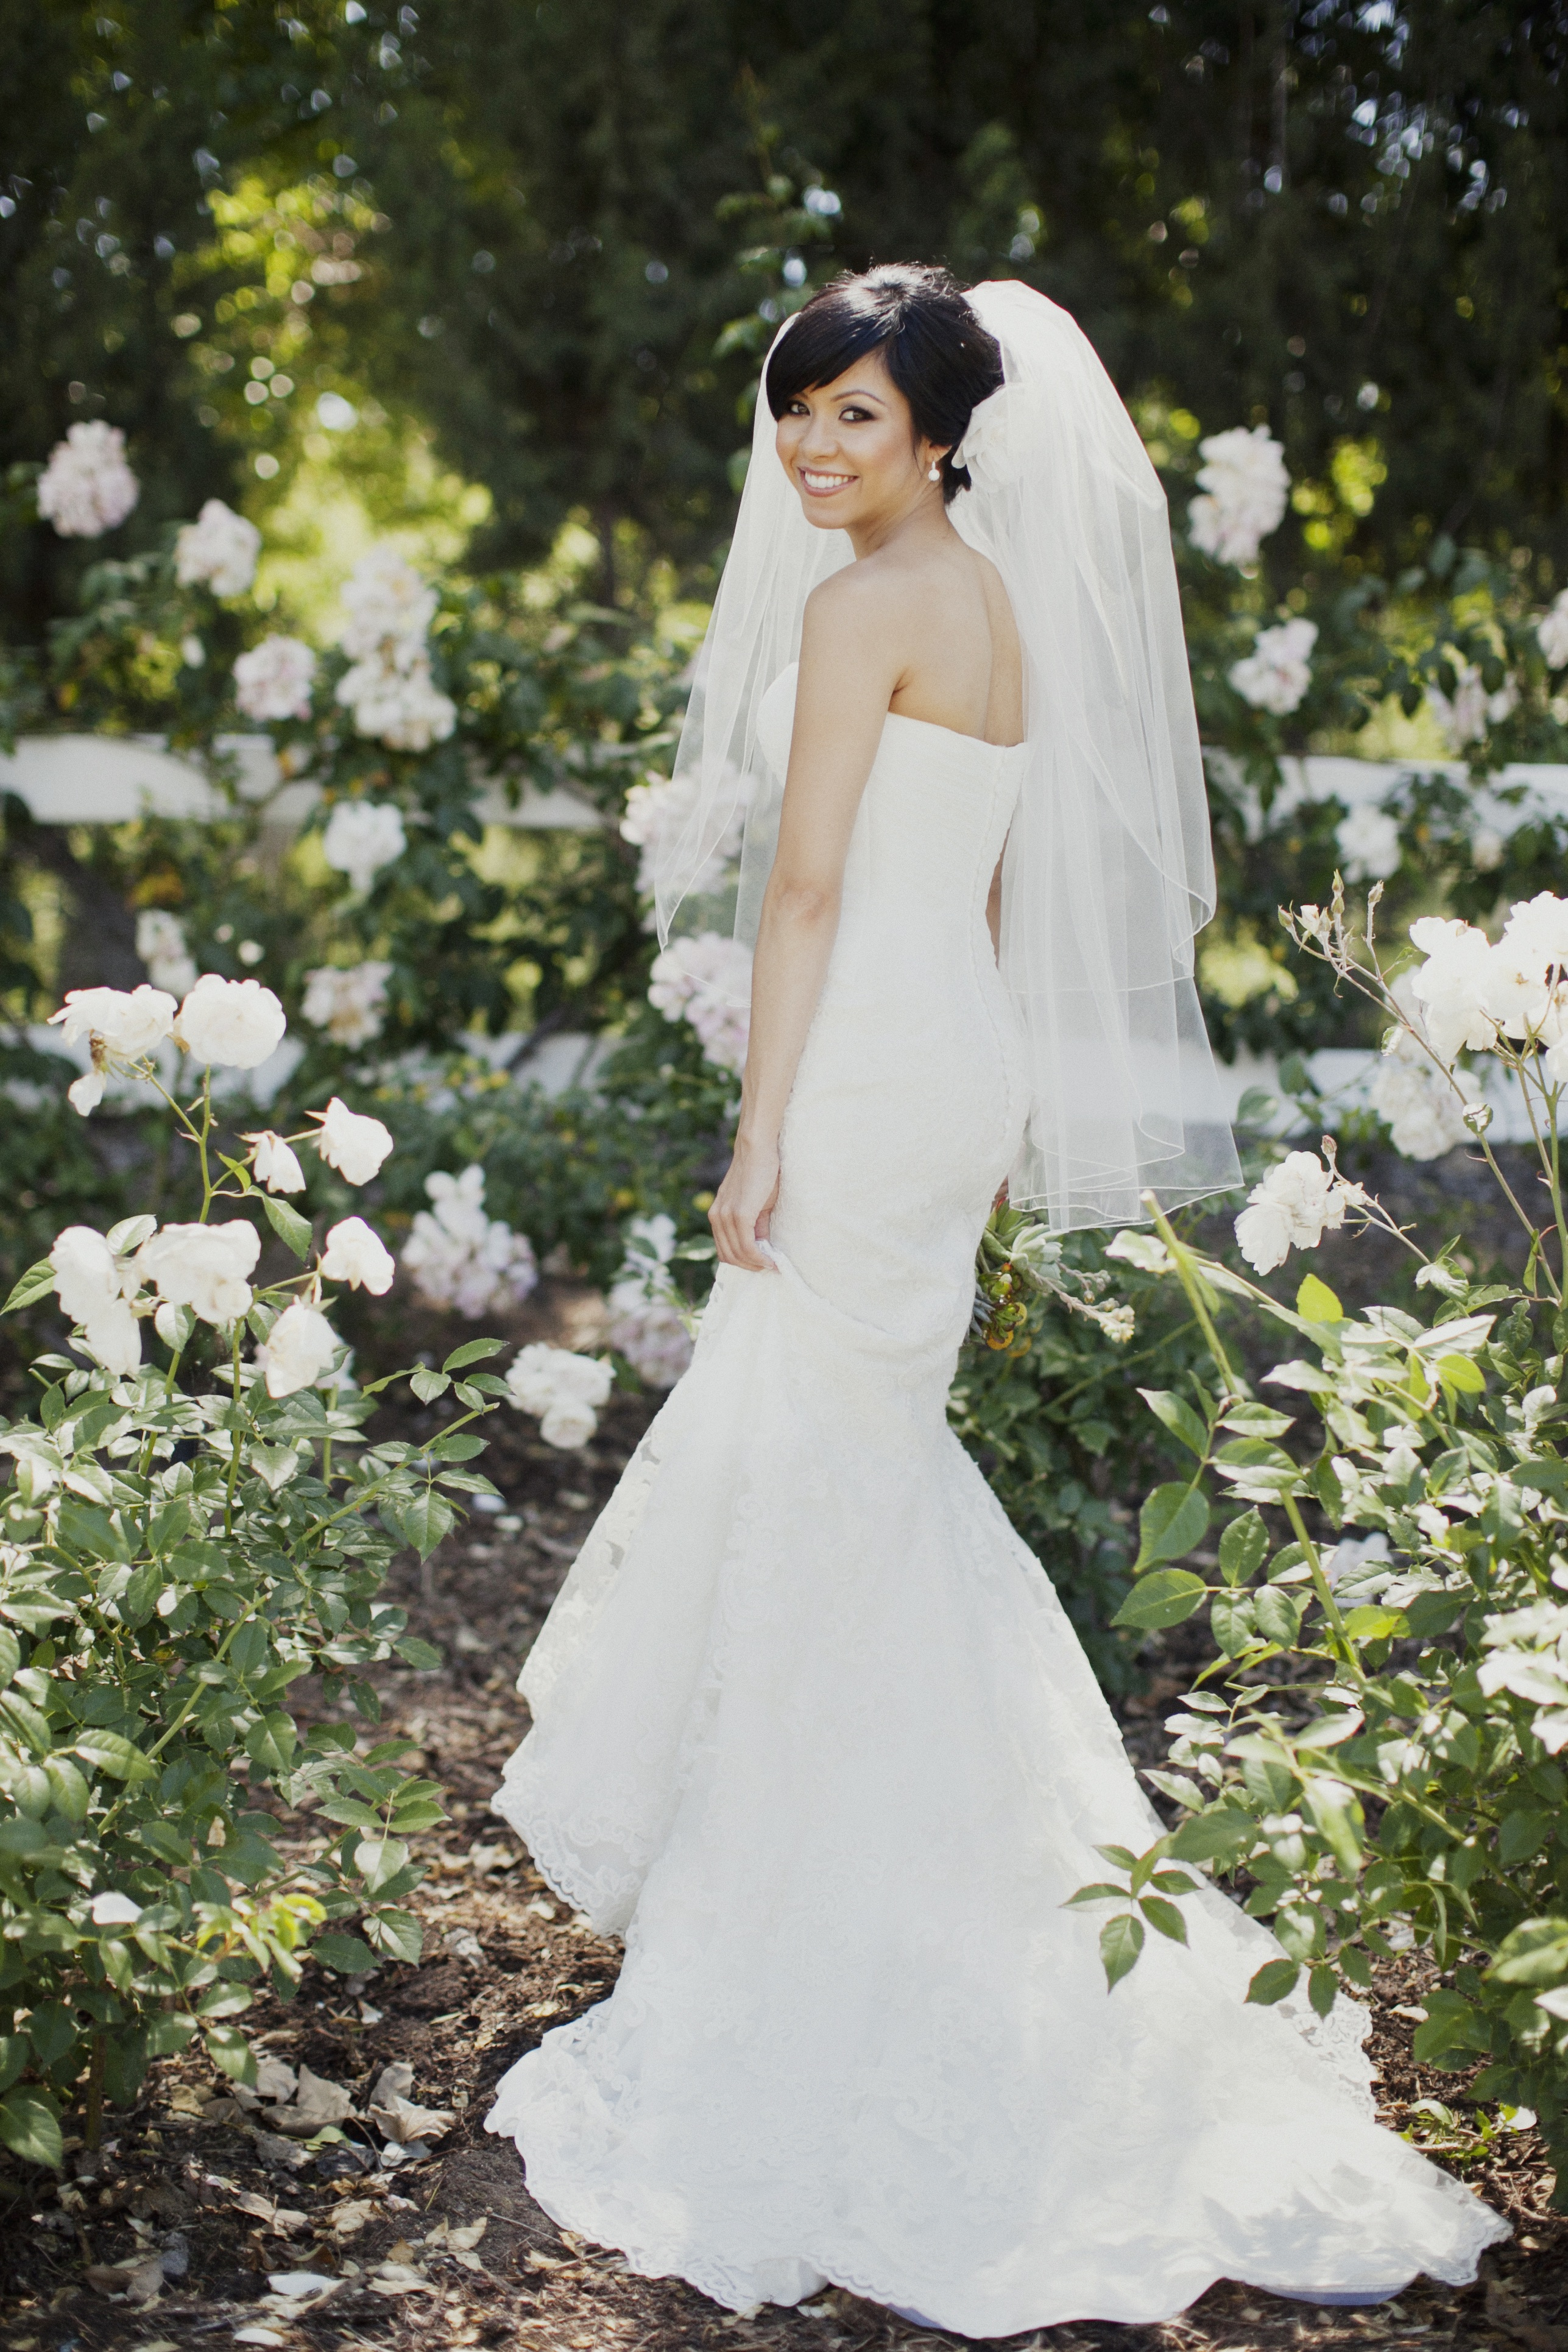 Wedding Dresses, Mermaid Wedding Dresses, Fashion, Real Weddings, Wedding Style, Rustic Real Weddings, West Coast Real Weddings, Eco-Friendly Real Weddings, Eco-Friendly Weddings, Rustic Weddings